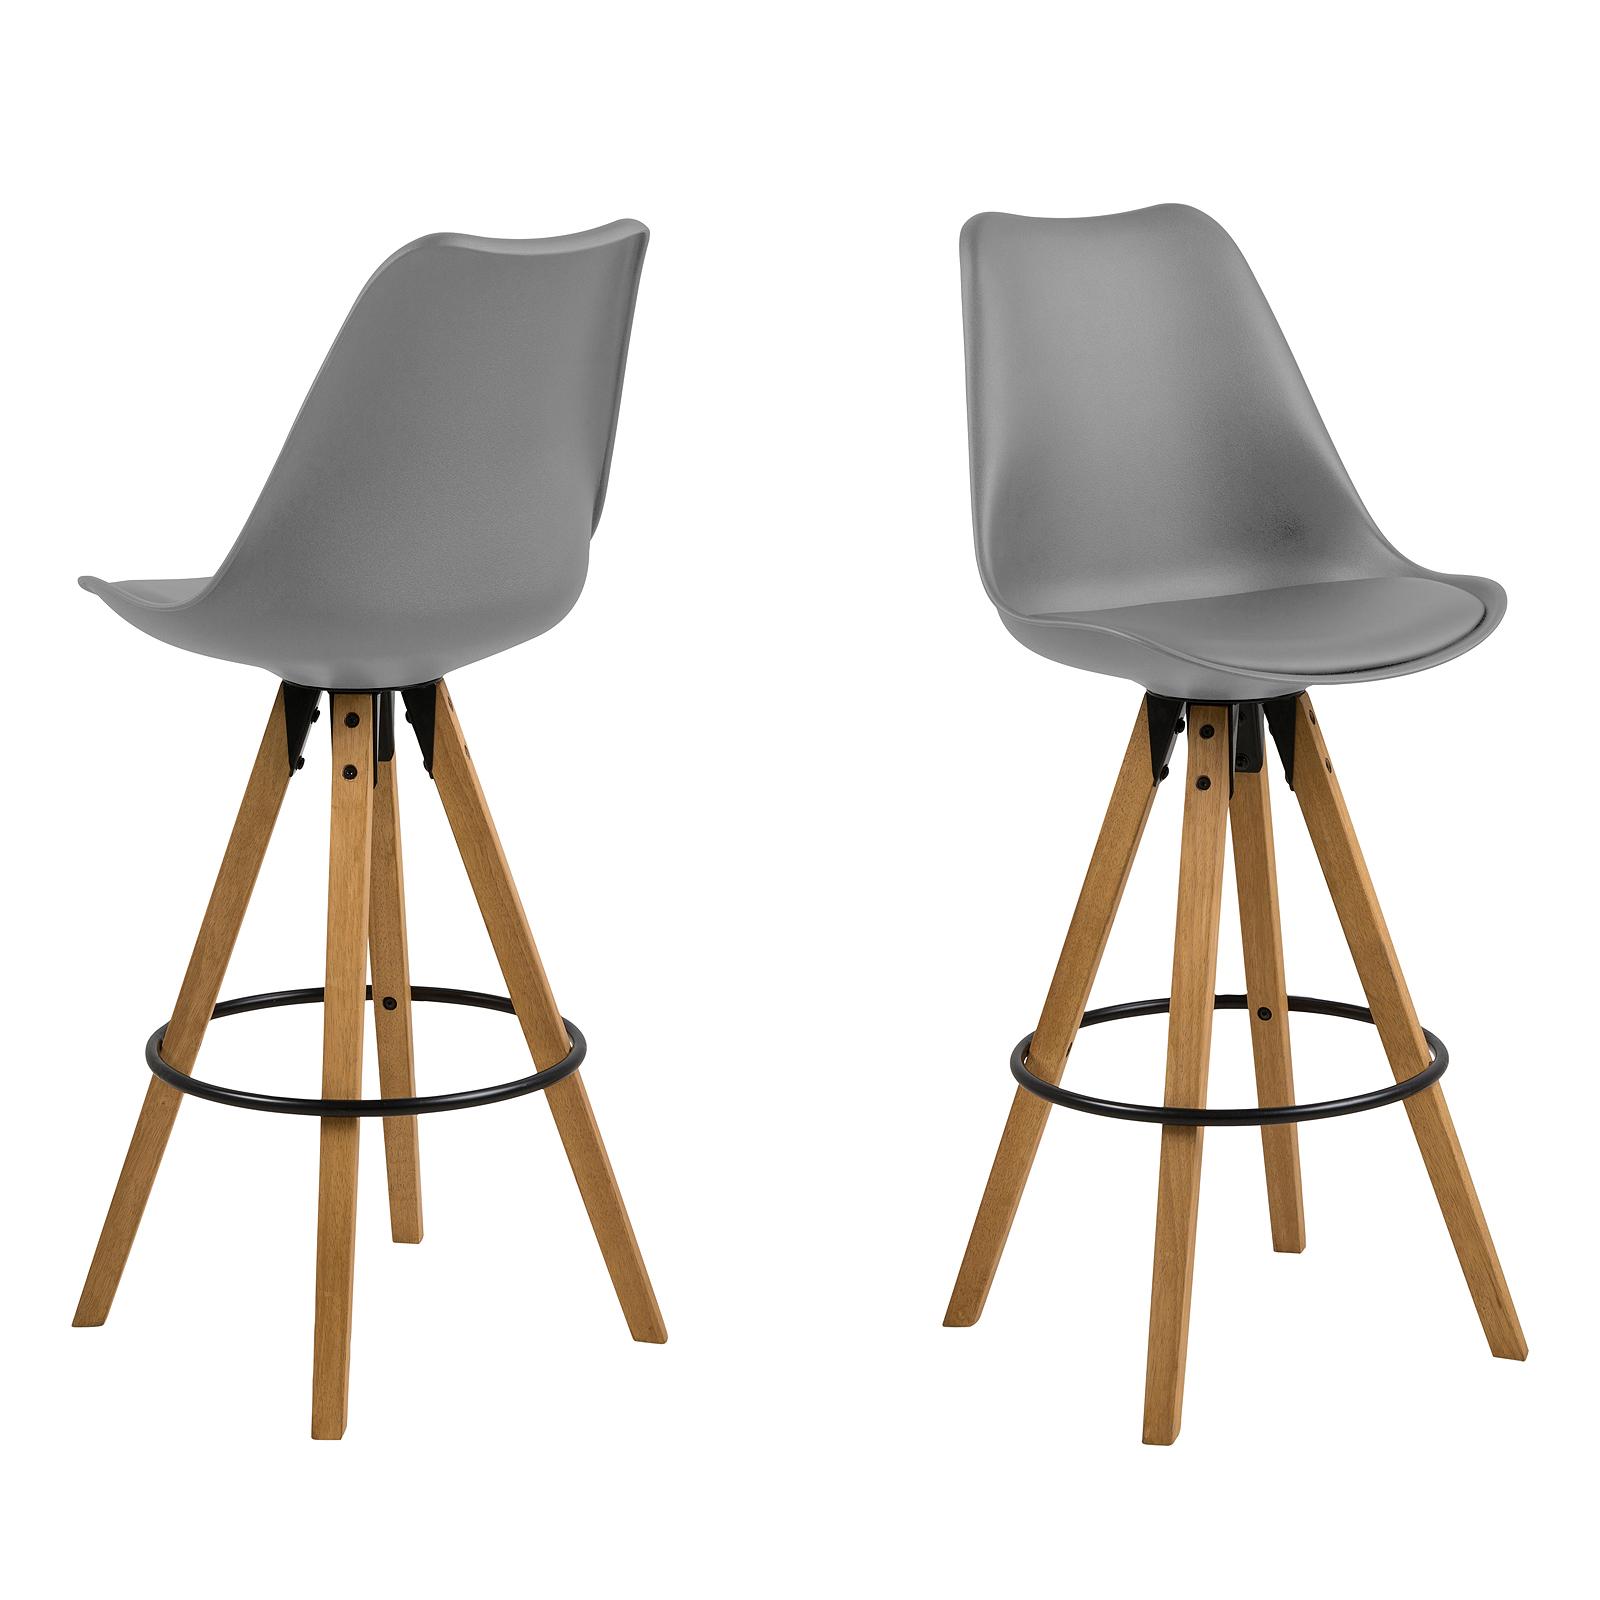 stuhl dima 2er set esszimmerstuhl oder barhocker bezug schwarz wei grau ebay. Black Bedroom Furniture Sets. Home Design Ideas